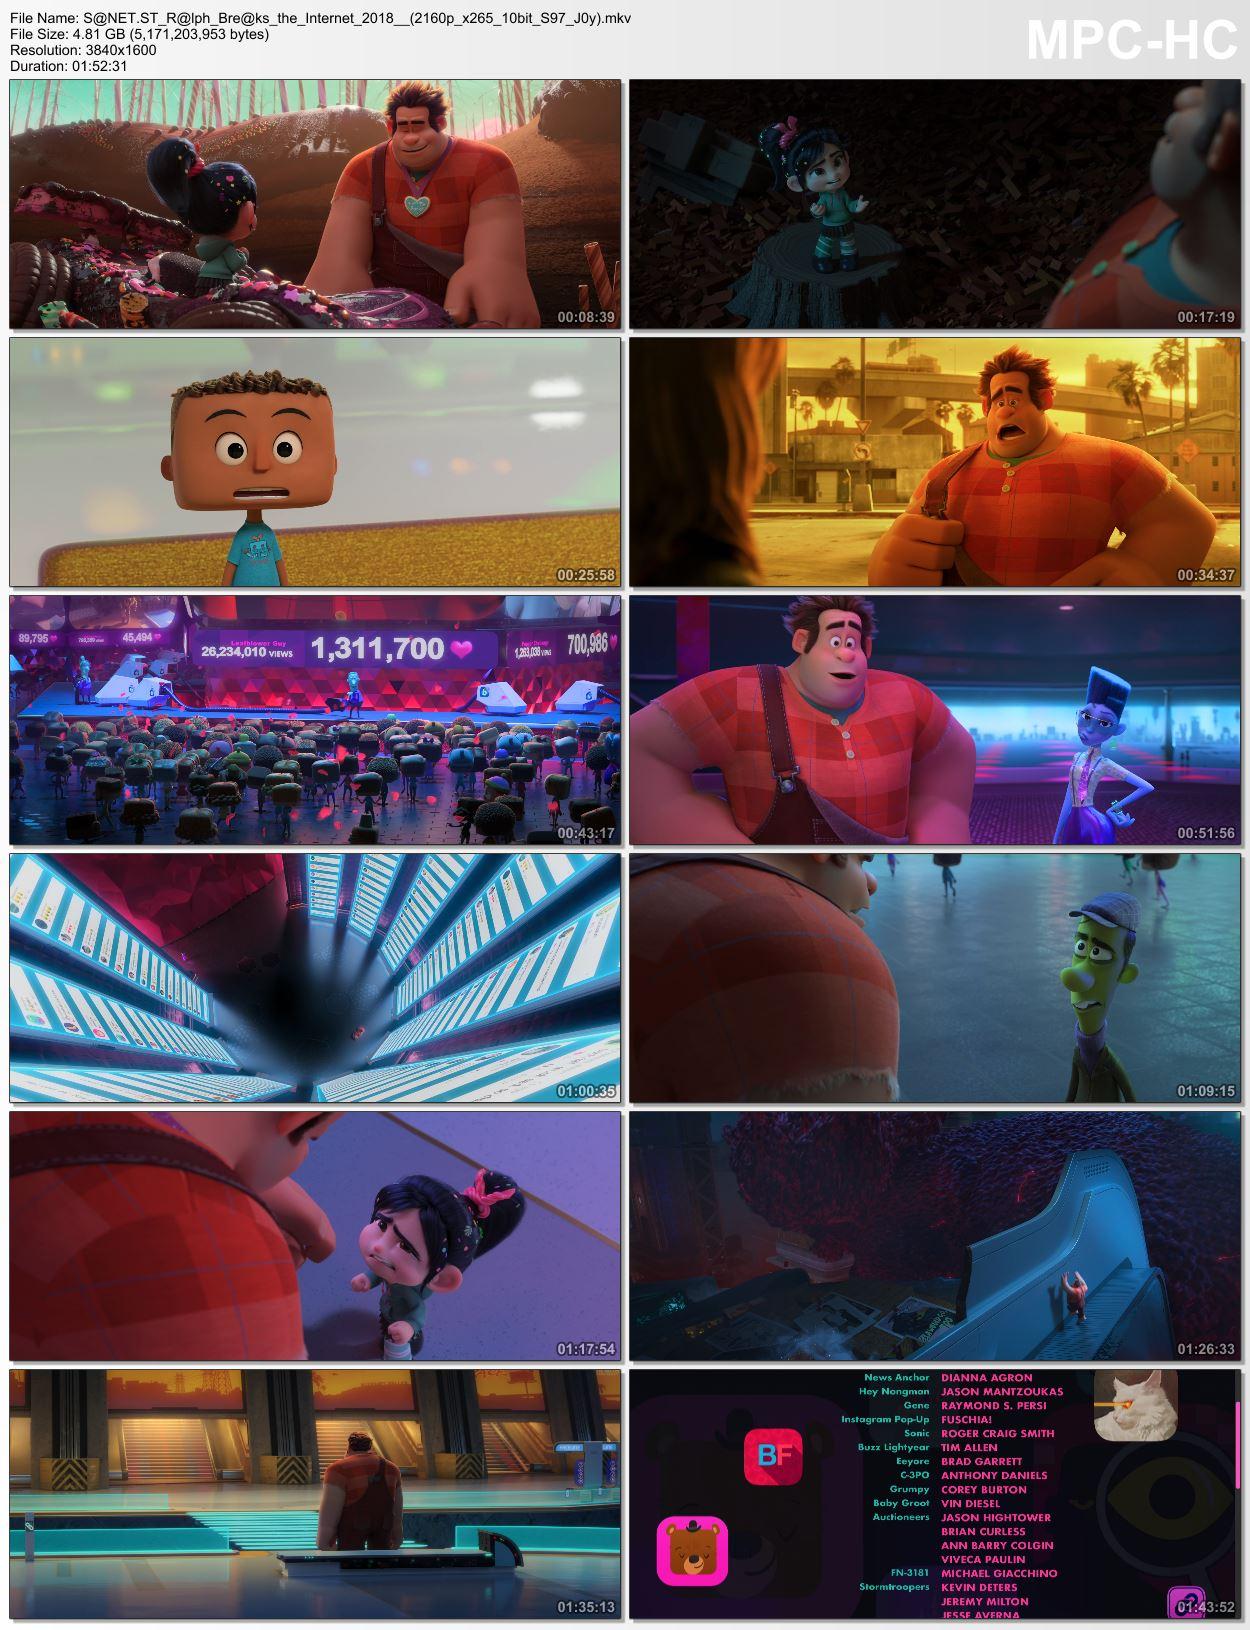 Download Ralph Breaks the Internet 2018 2160p BluRay x265 HEVC 10bit